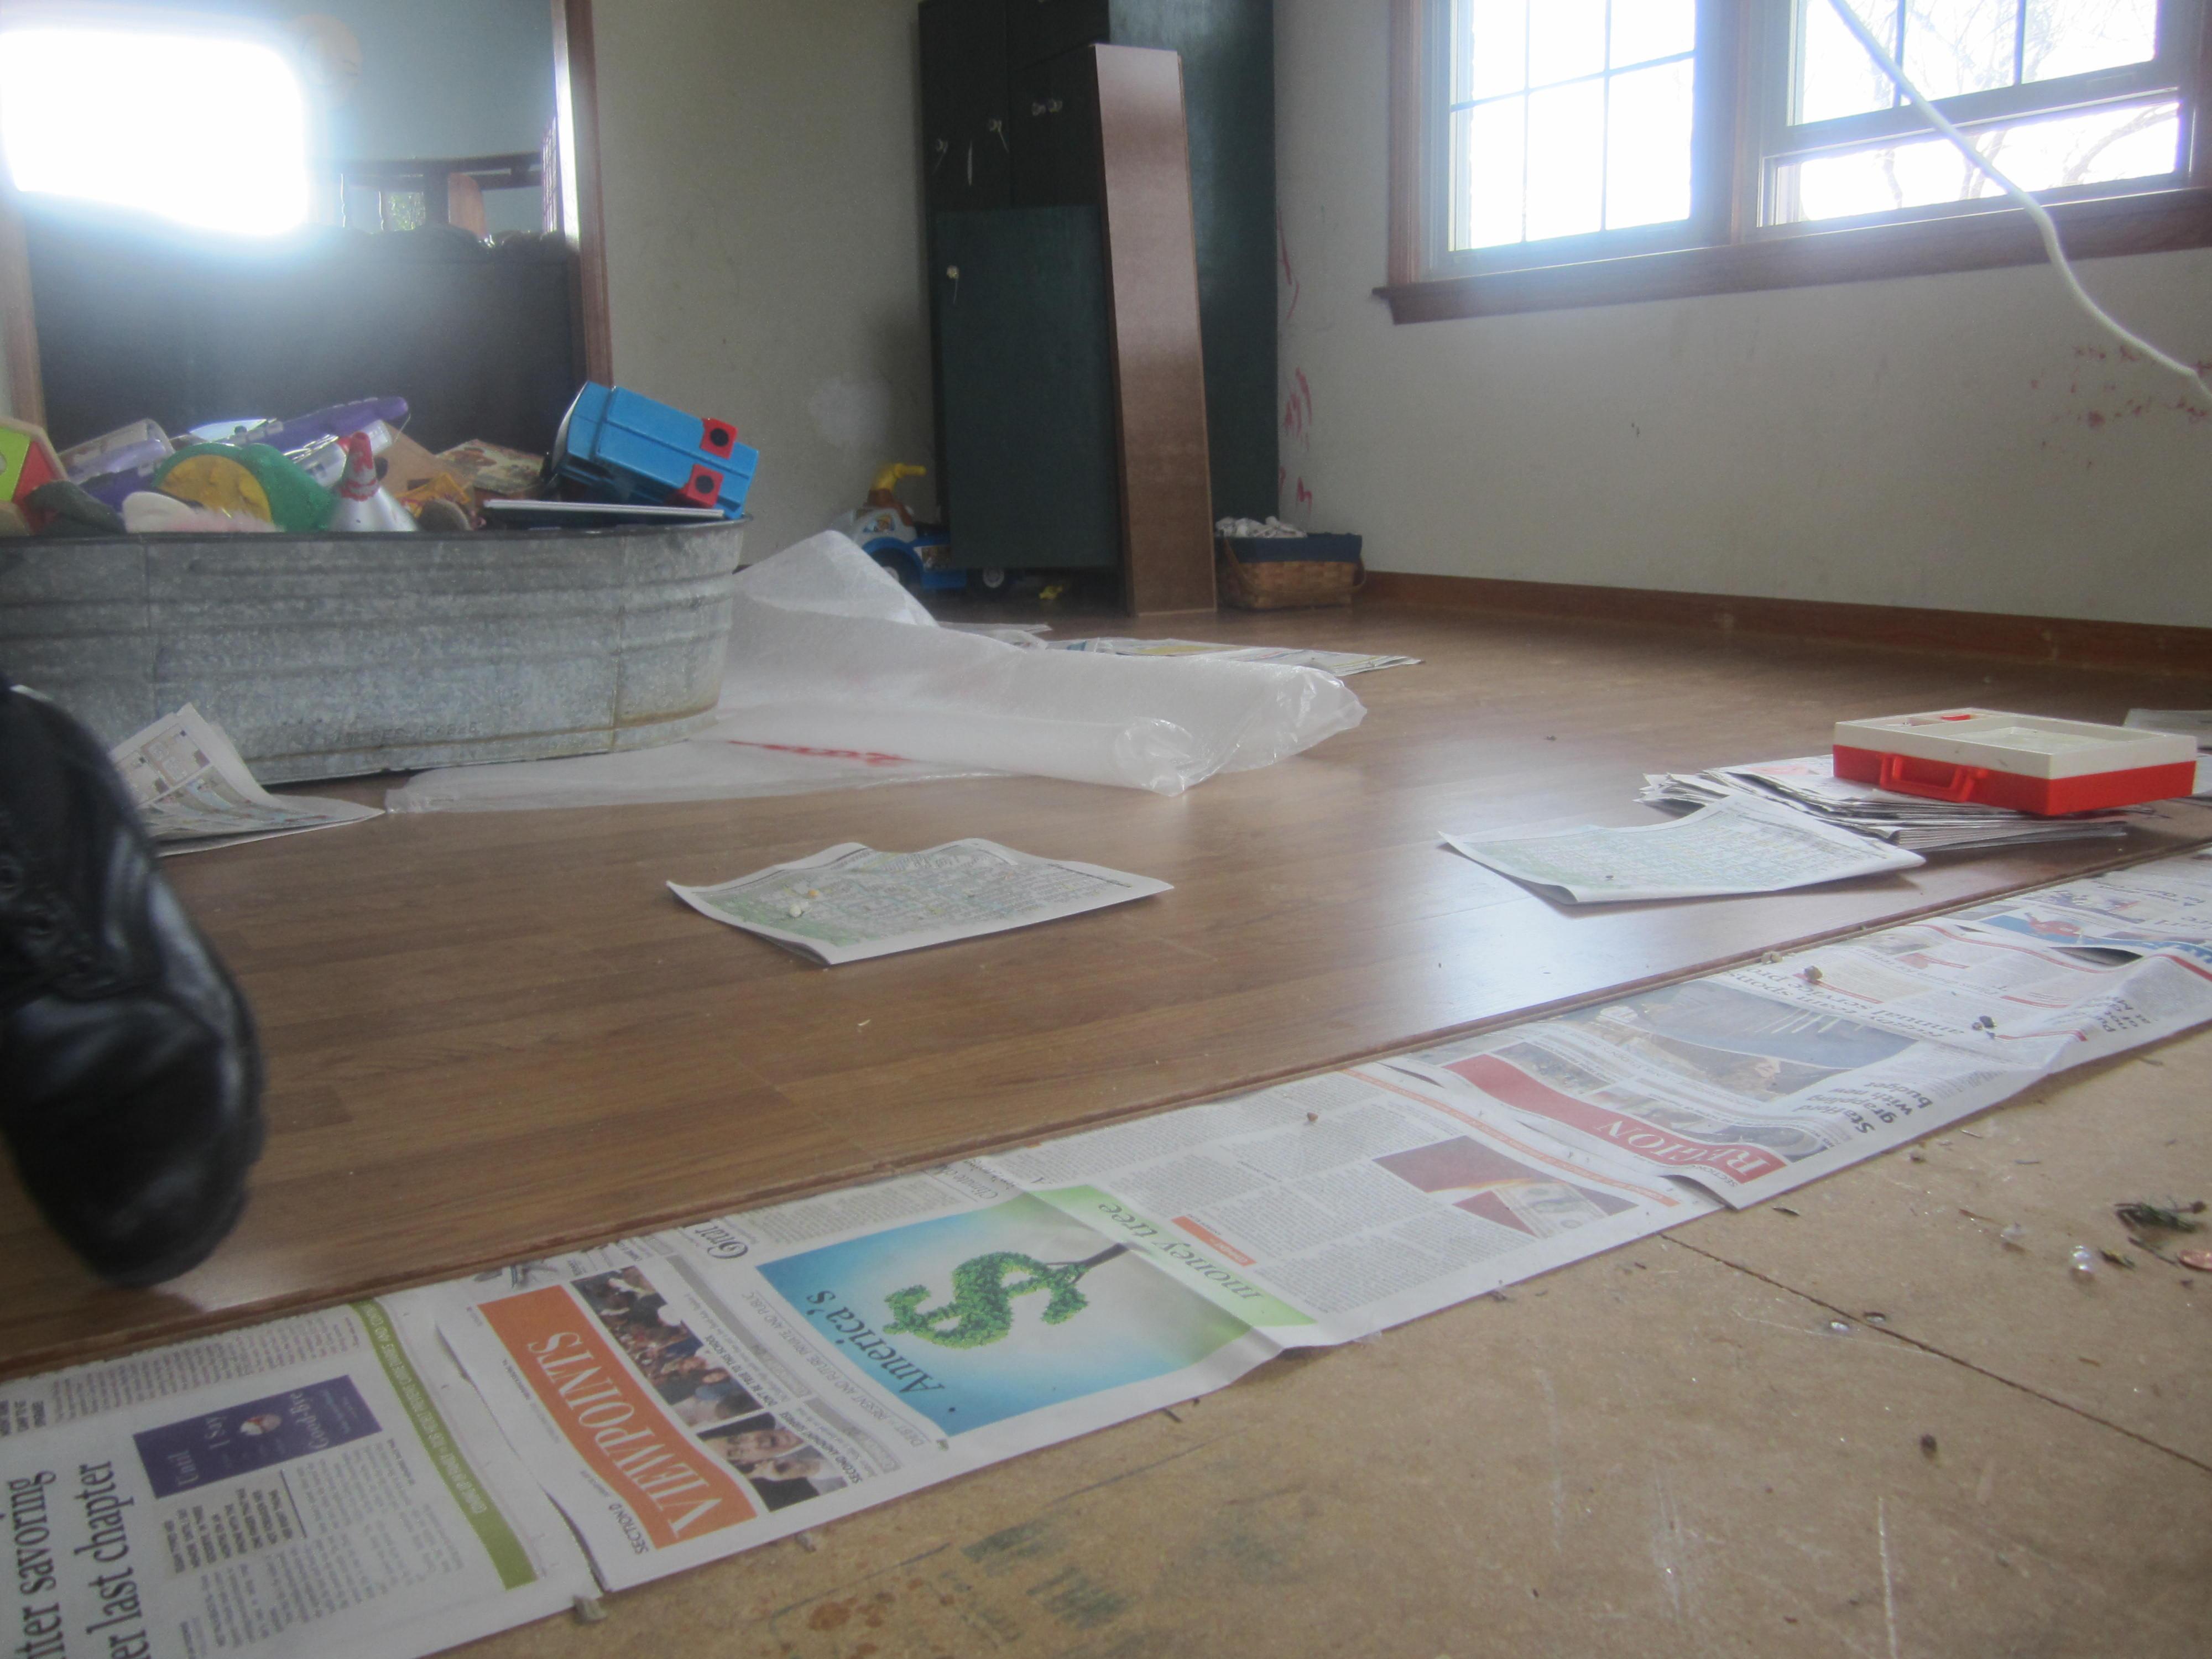 vinyl exquisite floors small for flooring mop reviews old reclaimed design underlayment hardwood and vacuum wood groove laminate hard engineered floor oak designs in pf tongue organize kitchen best bedroom